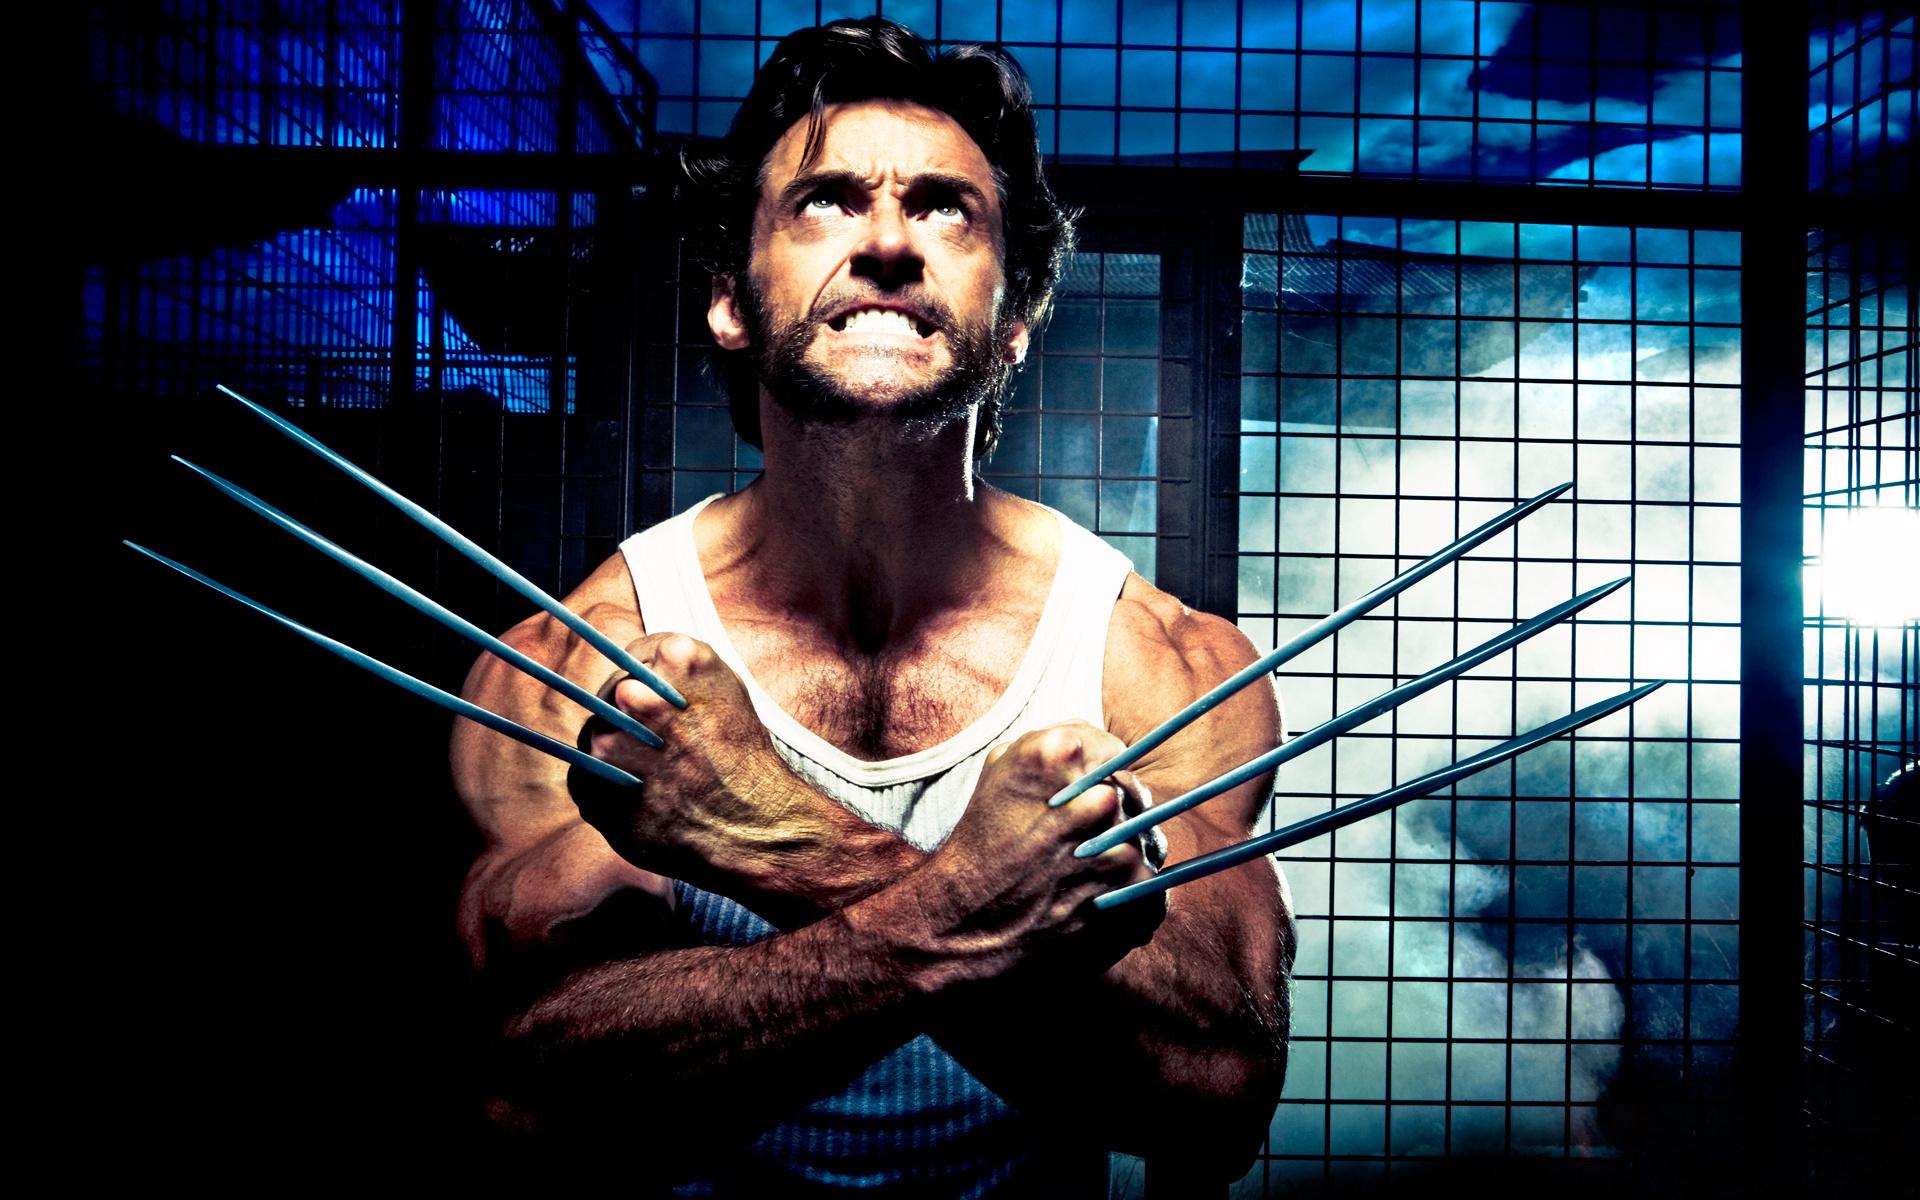 Hugh Jackman Wallpaper wolverine x man hugh jackman wolverine a mutant hero man actor